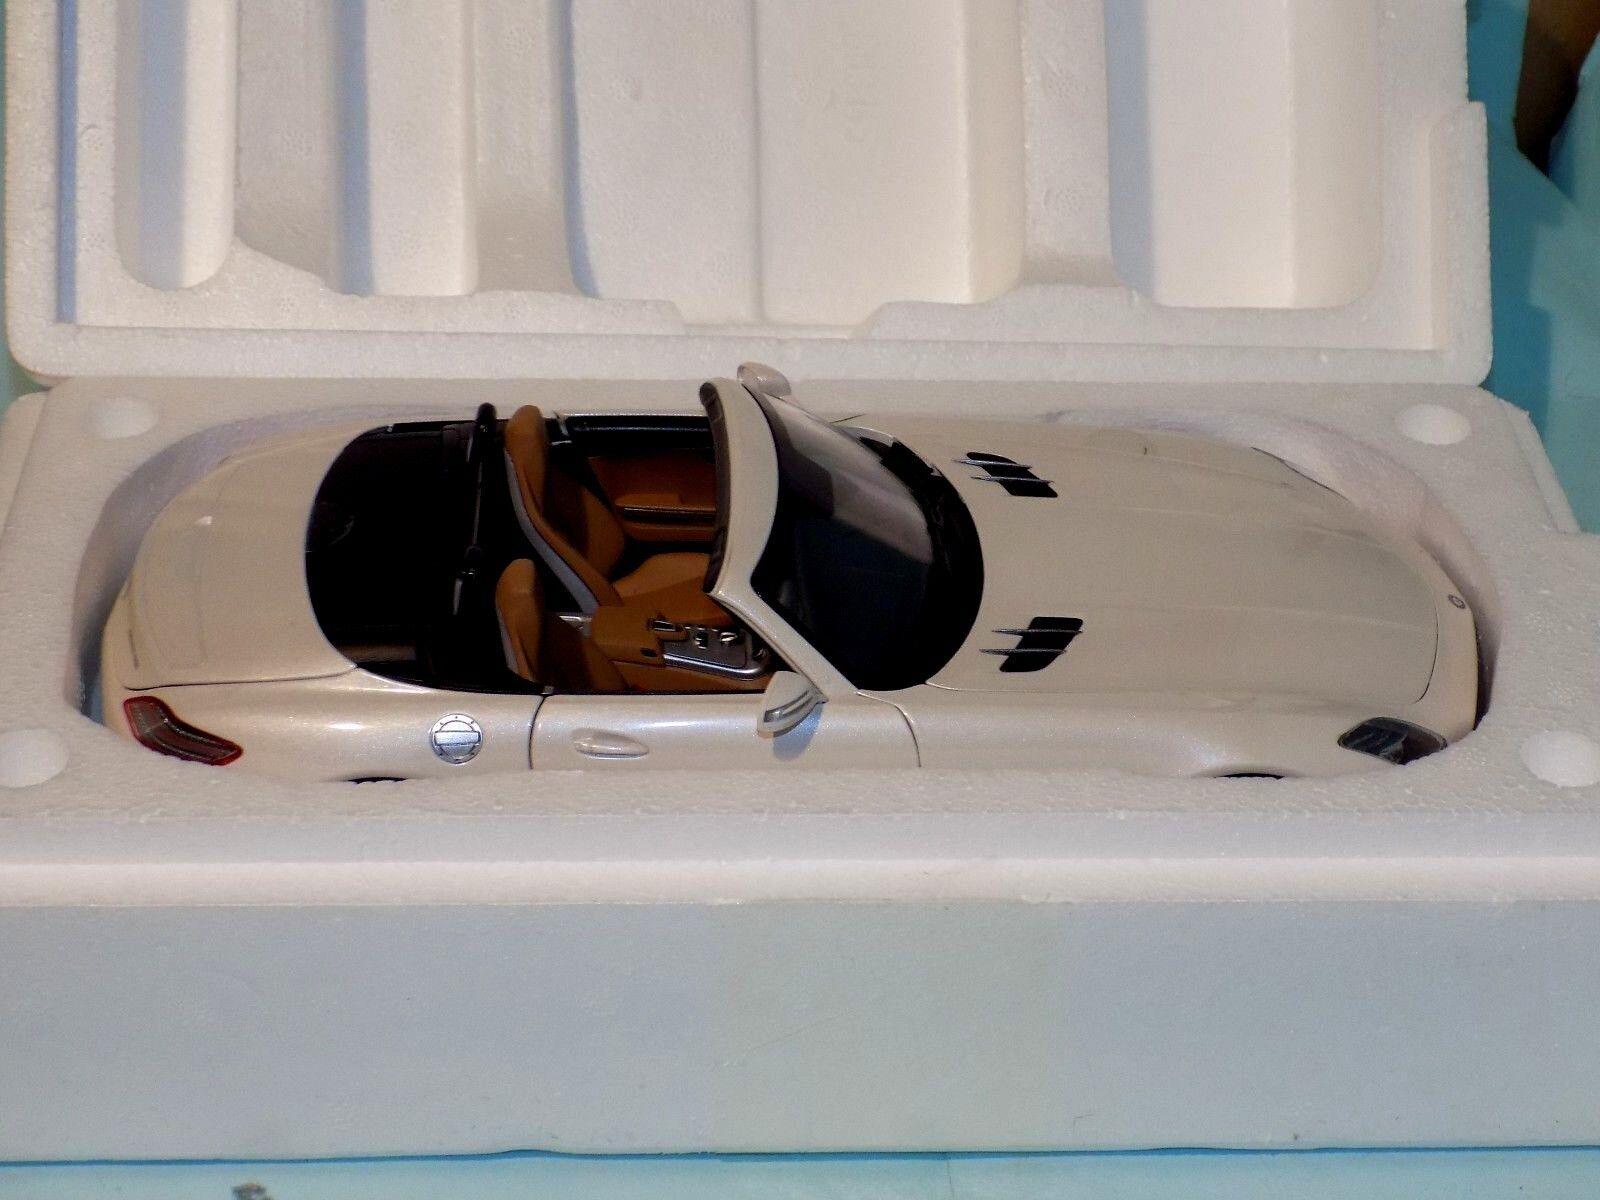 Mercedes-Benz SLS AMG Roadster 2011 metallic white NOREV  183491  1 18